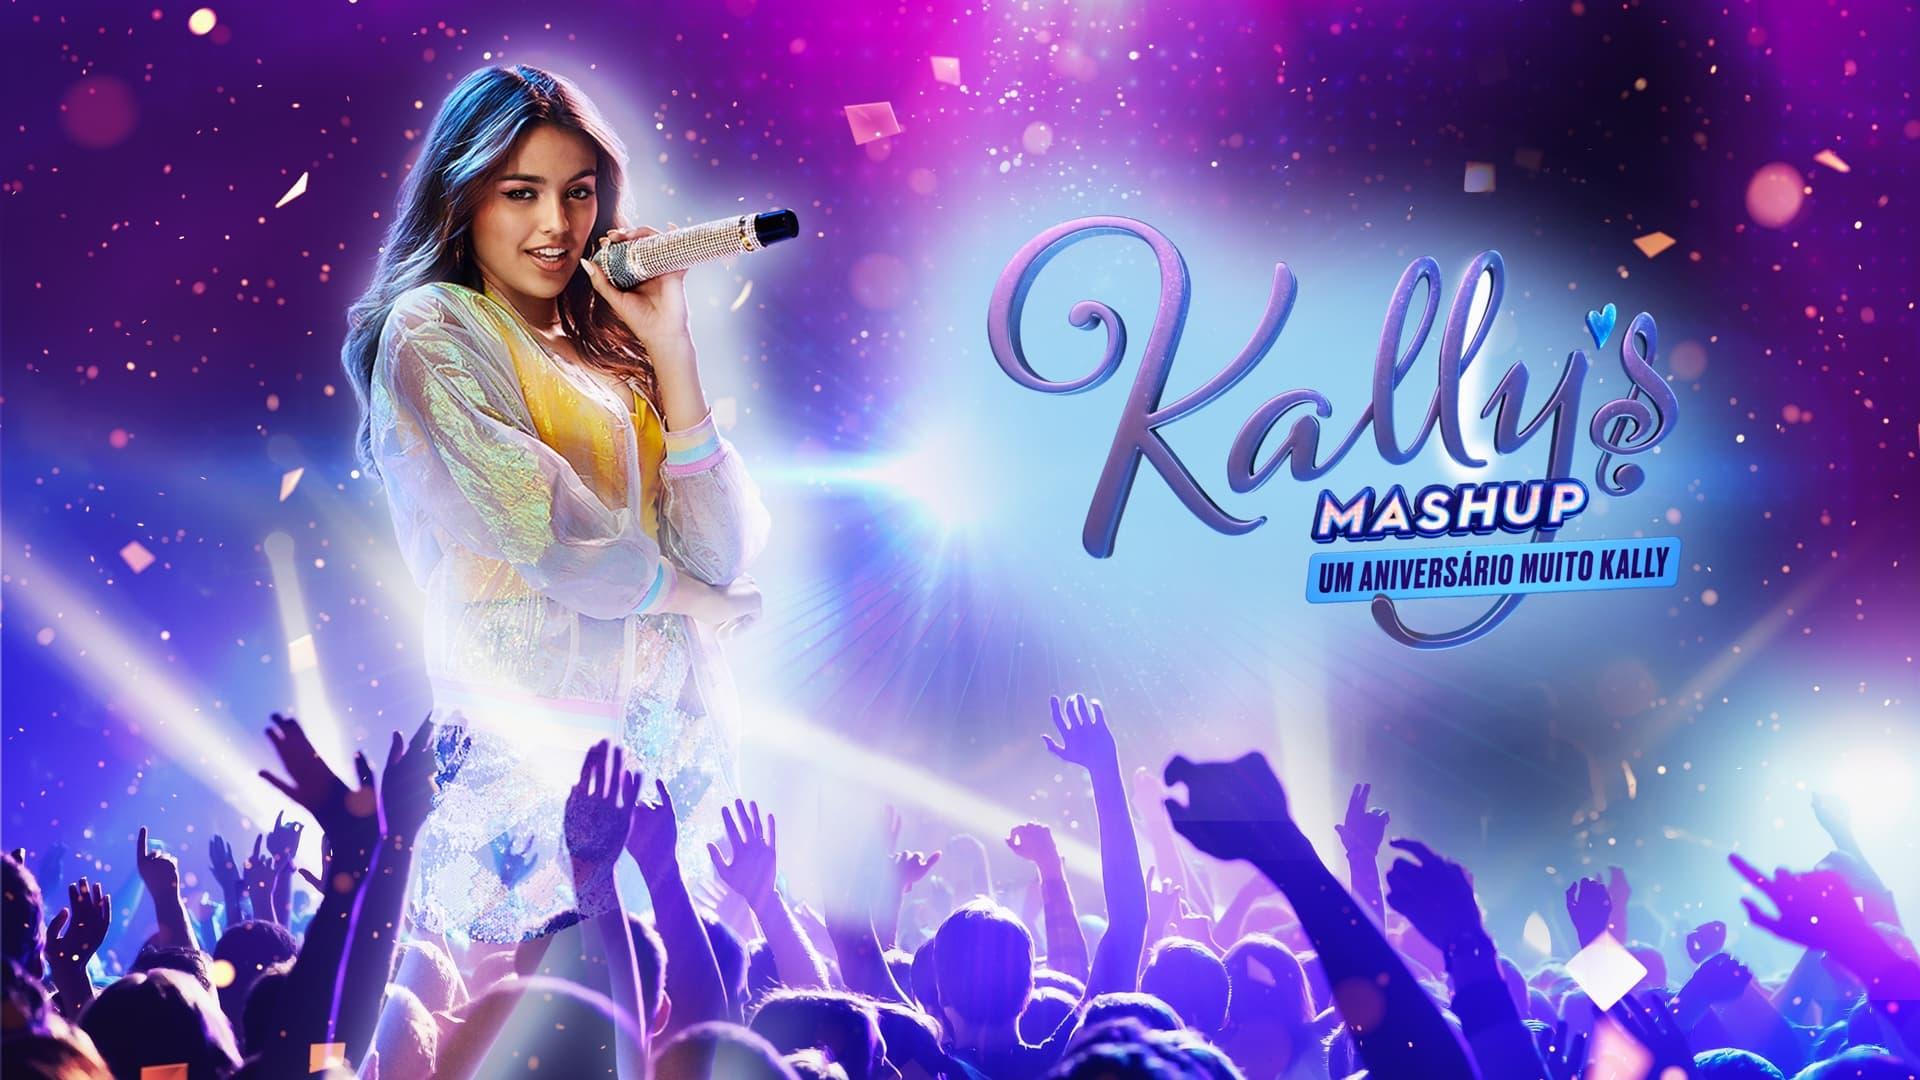 Kally's Mashup, A very Kally's Birthday (2021) Stream